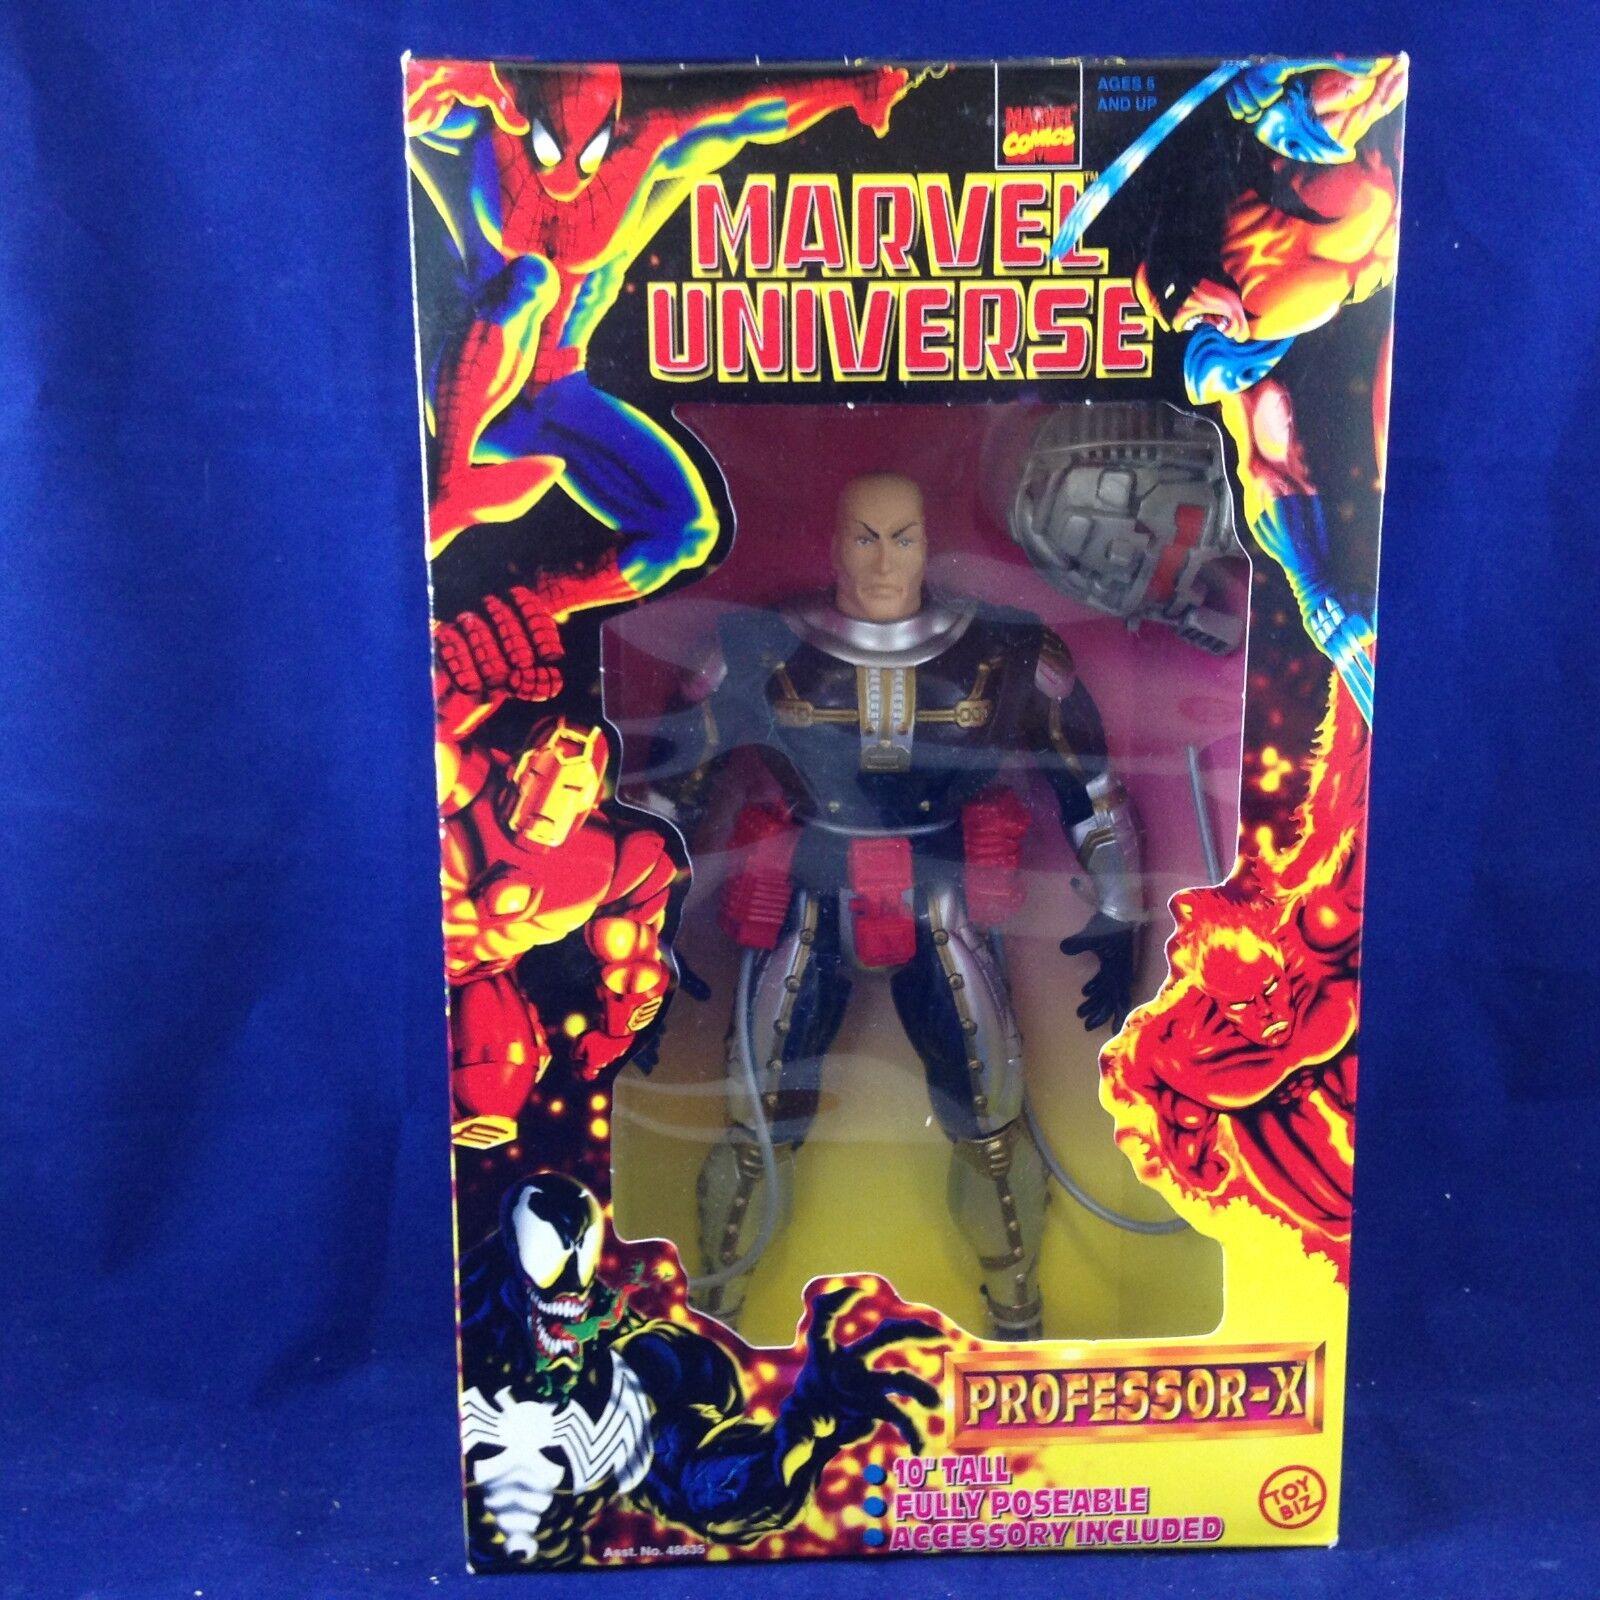 Marvel - universum professor-x 48638 1997 nr. 10